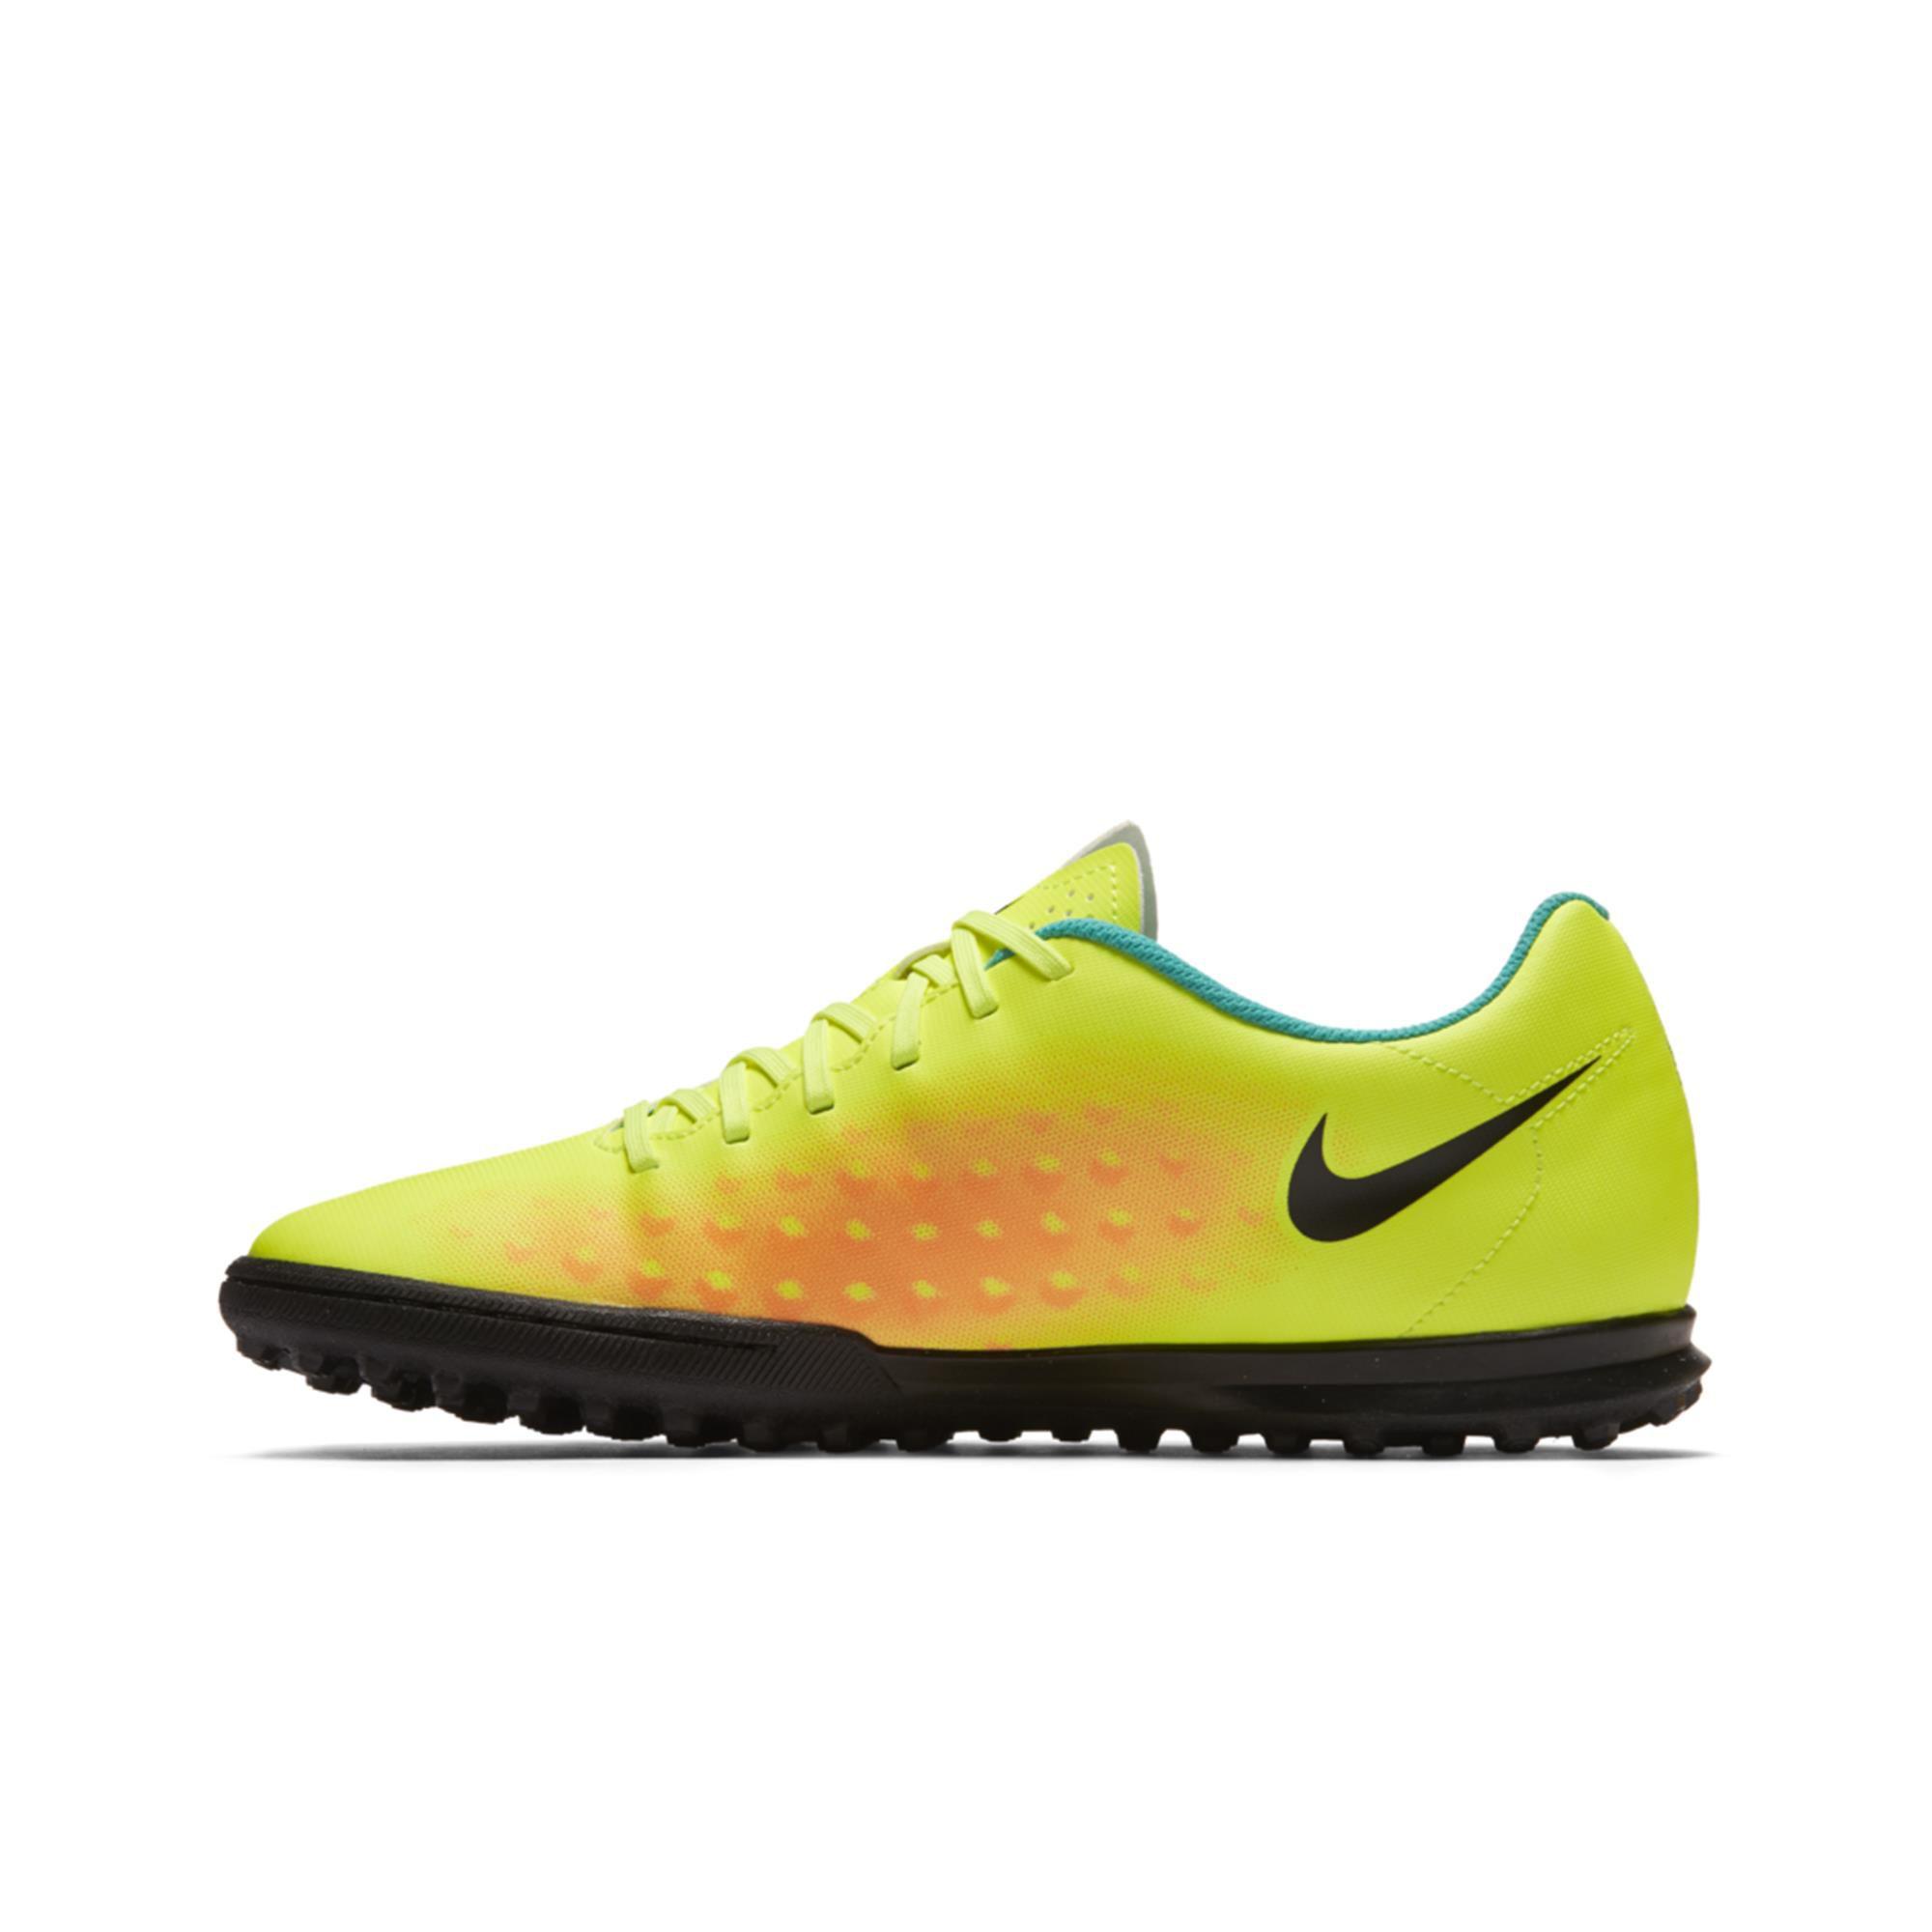 92e7e7d572607 Chuteira Nike Magista Ola Ii Tf Society - BRACIA SHOP  Loja de ...